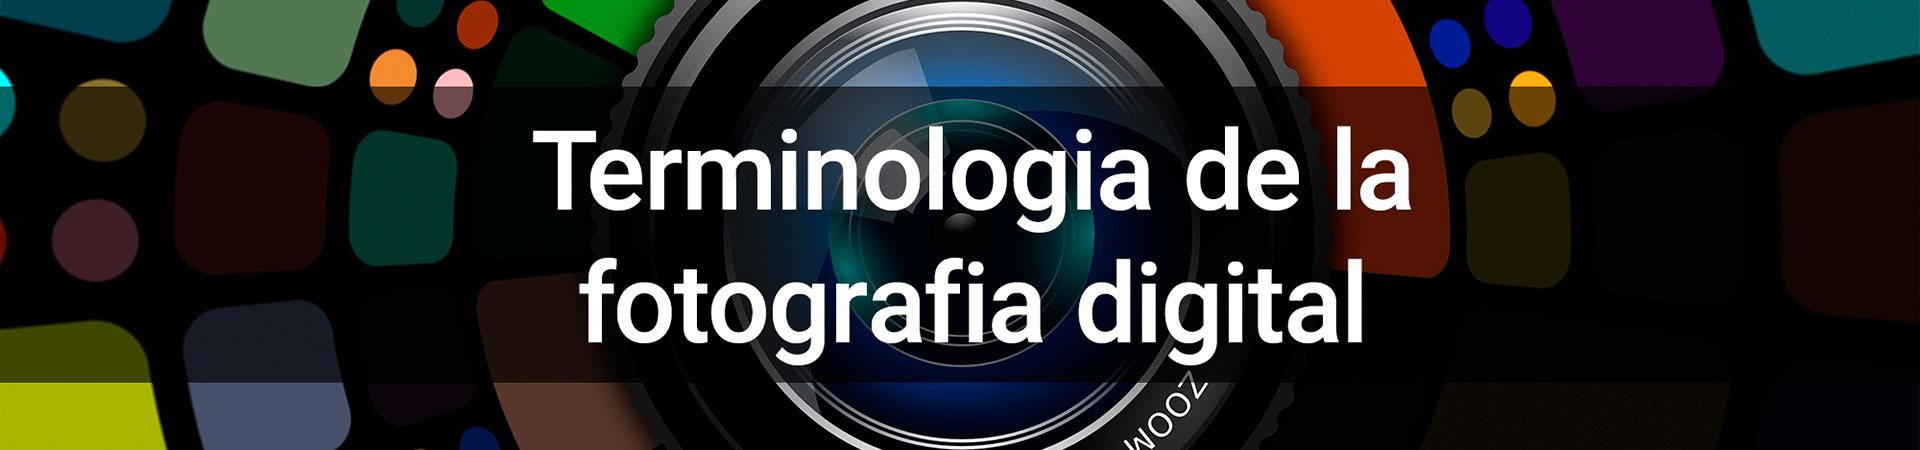 Terminologia de la fotografia digital